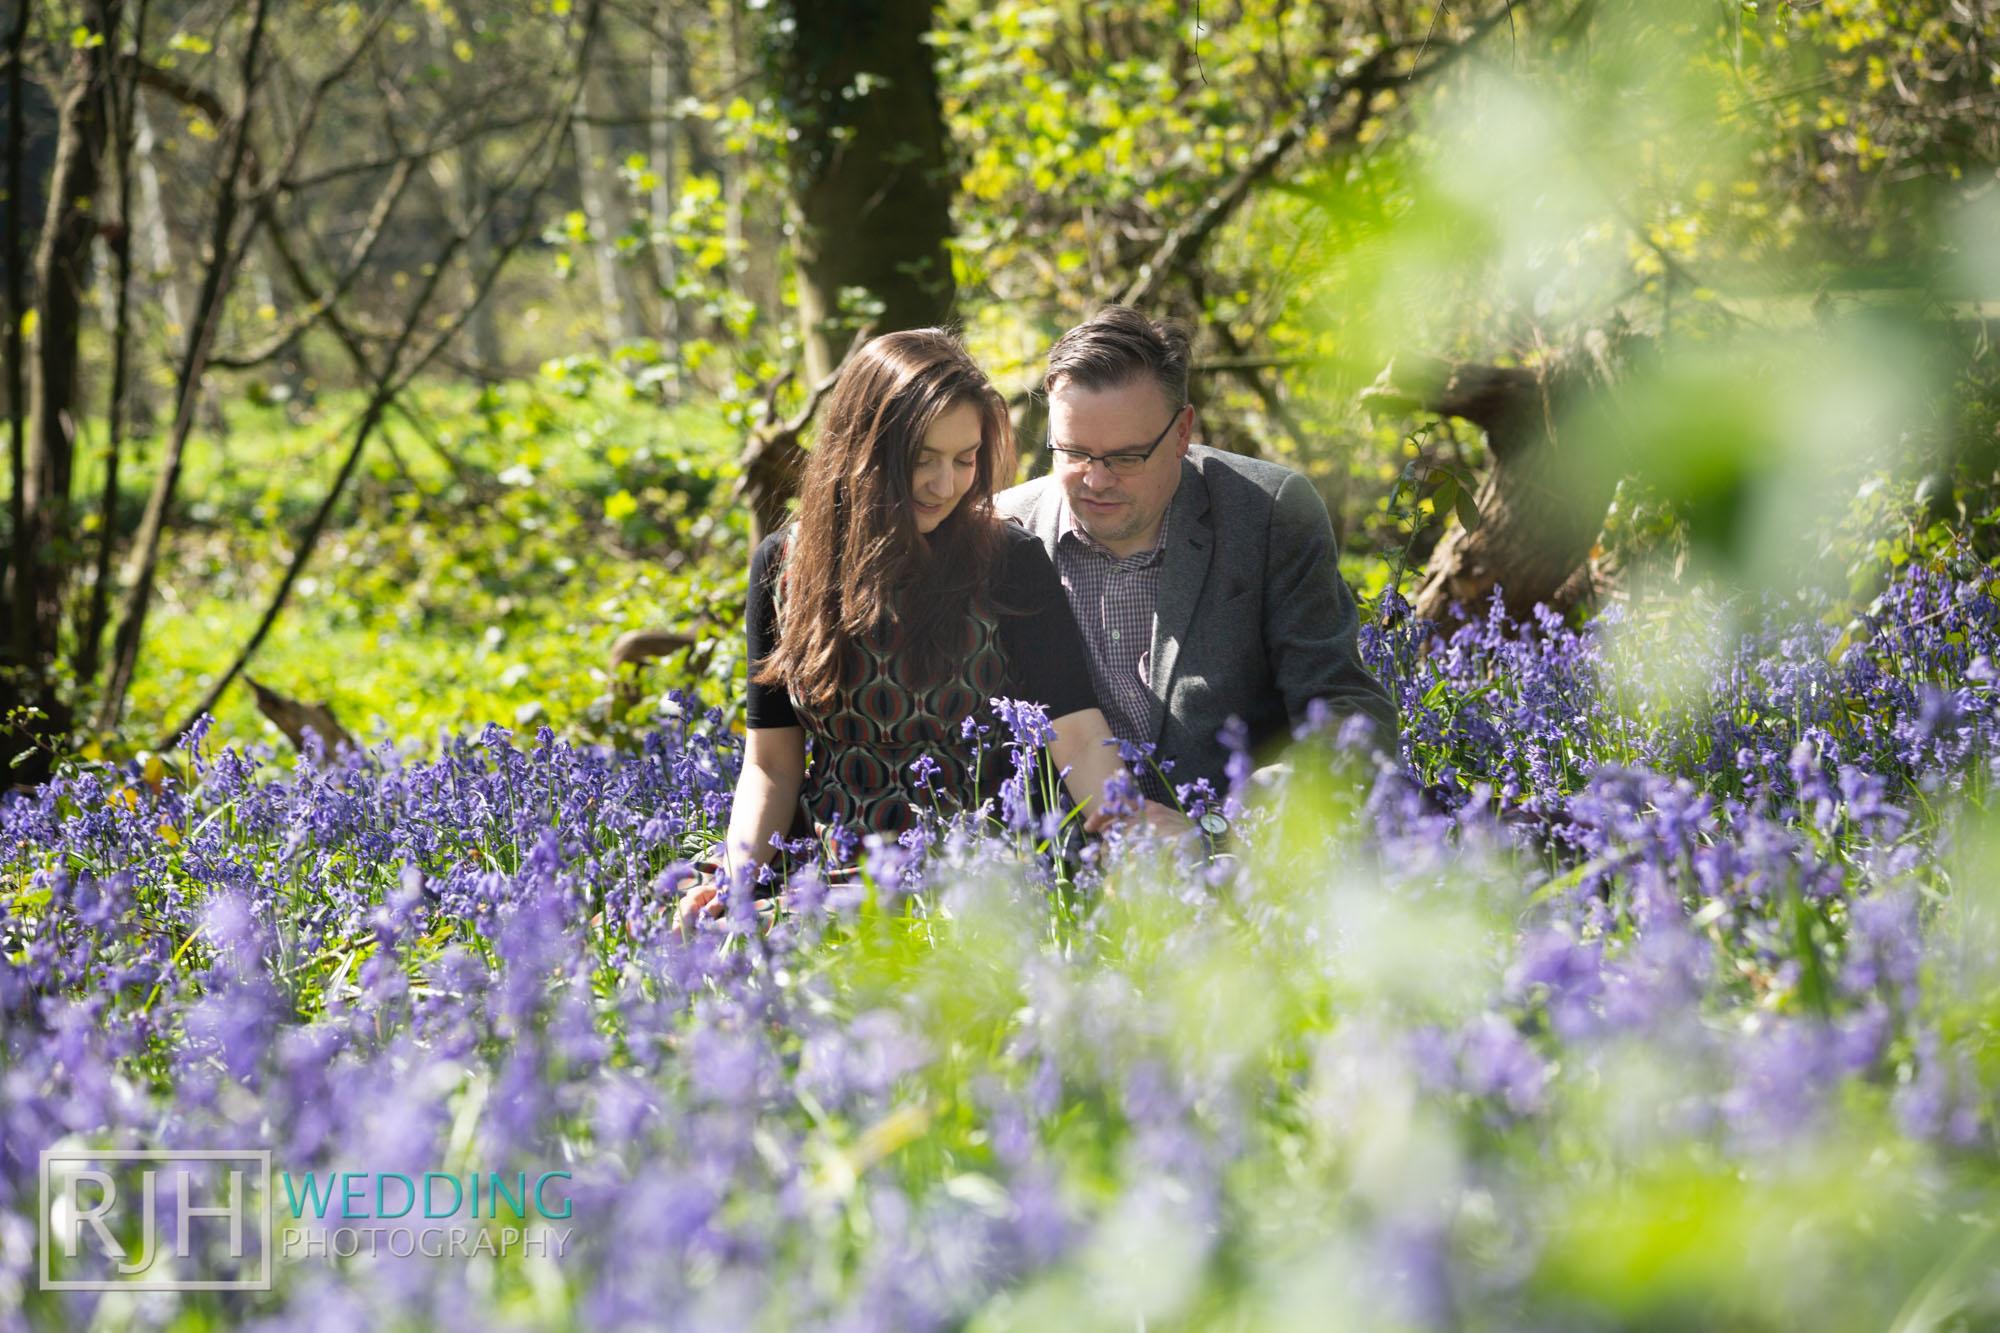 Pre-wedding photography - Richard & Rachel_019_3C2A8239.jpg